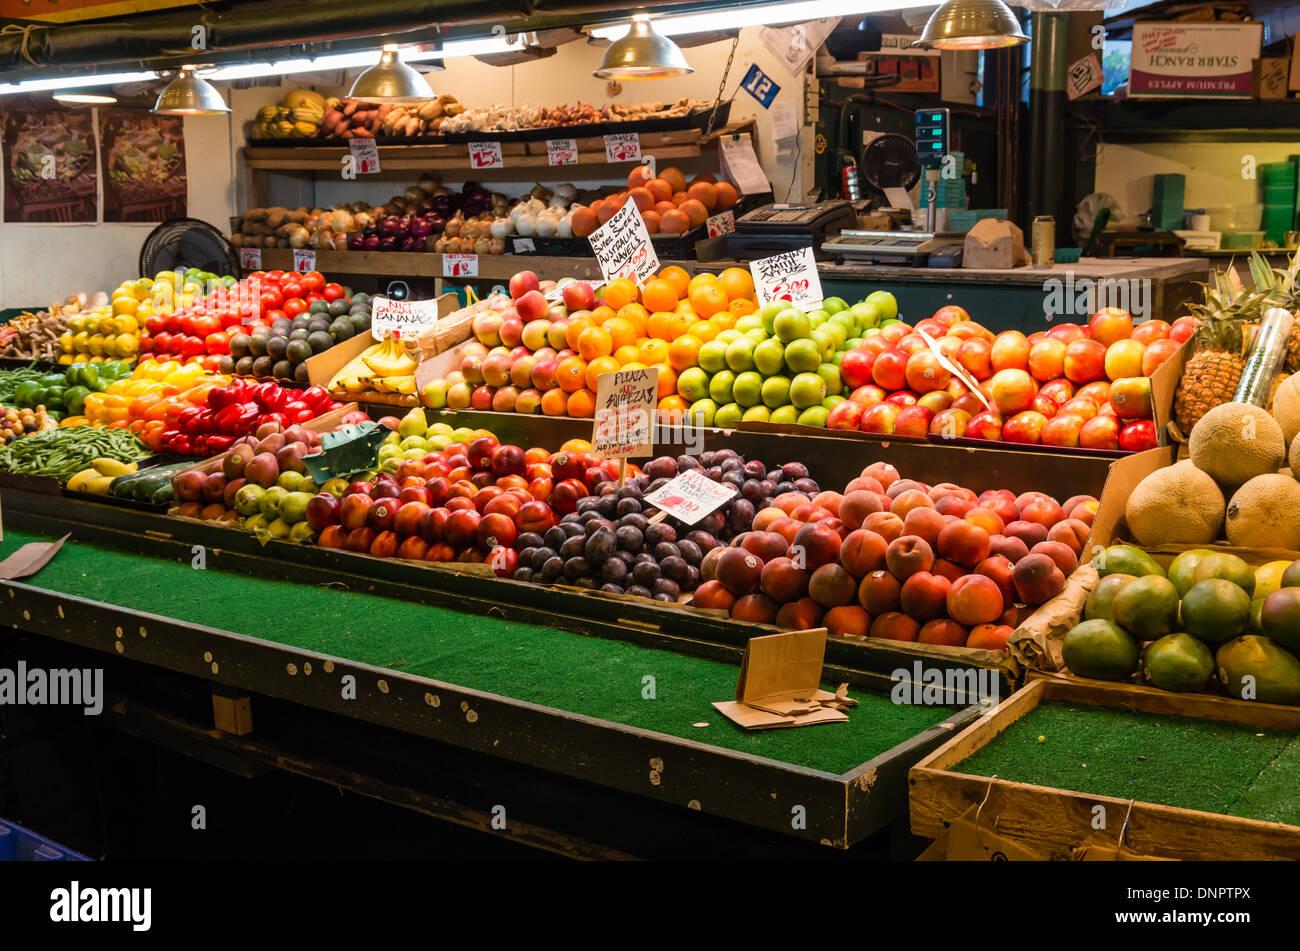 Fresh fruit on display at a produce vendor's market stall Pike Place Market Seattle, Washington, USA - Stock Image